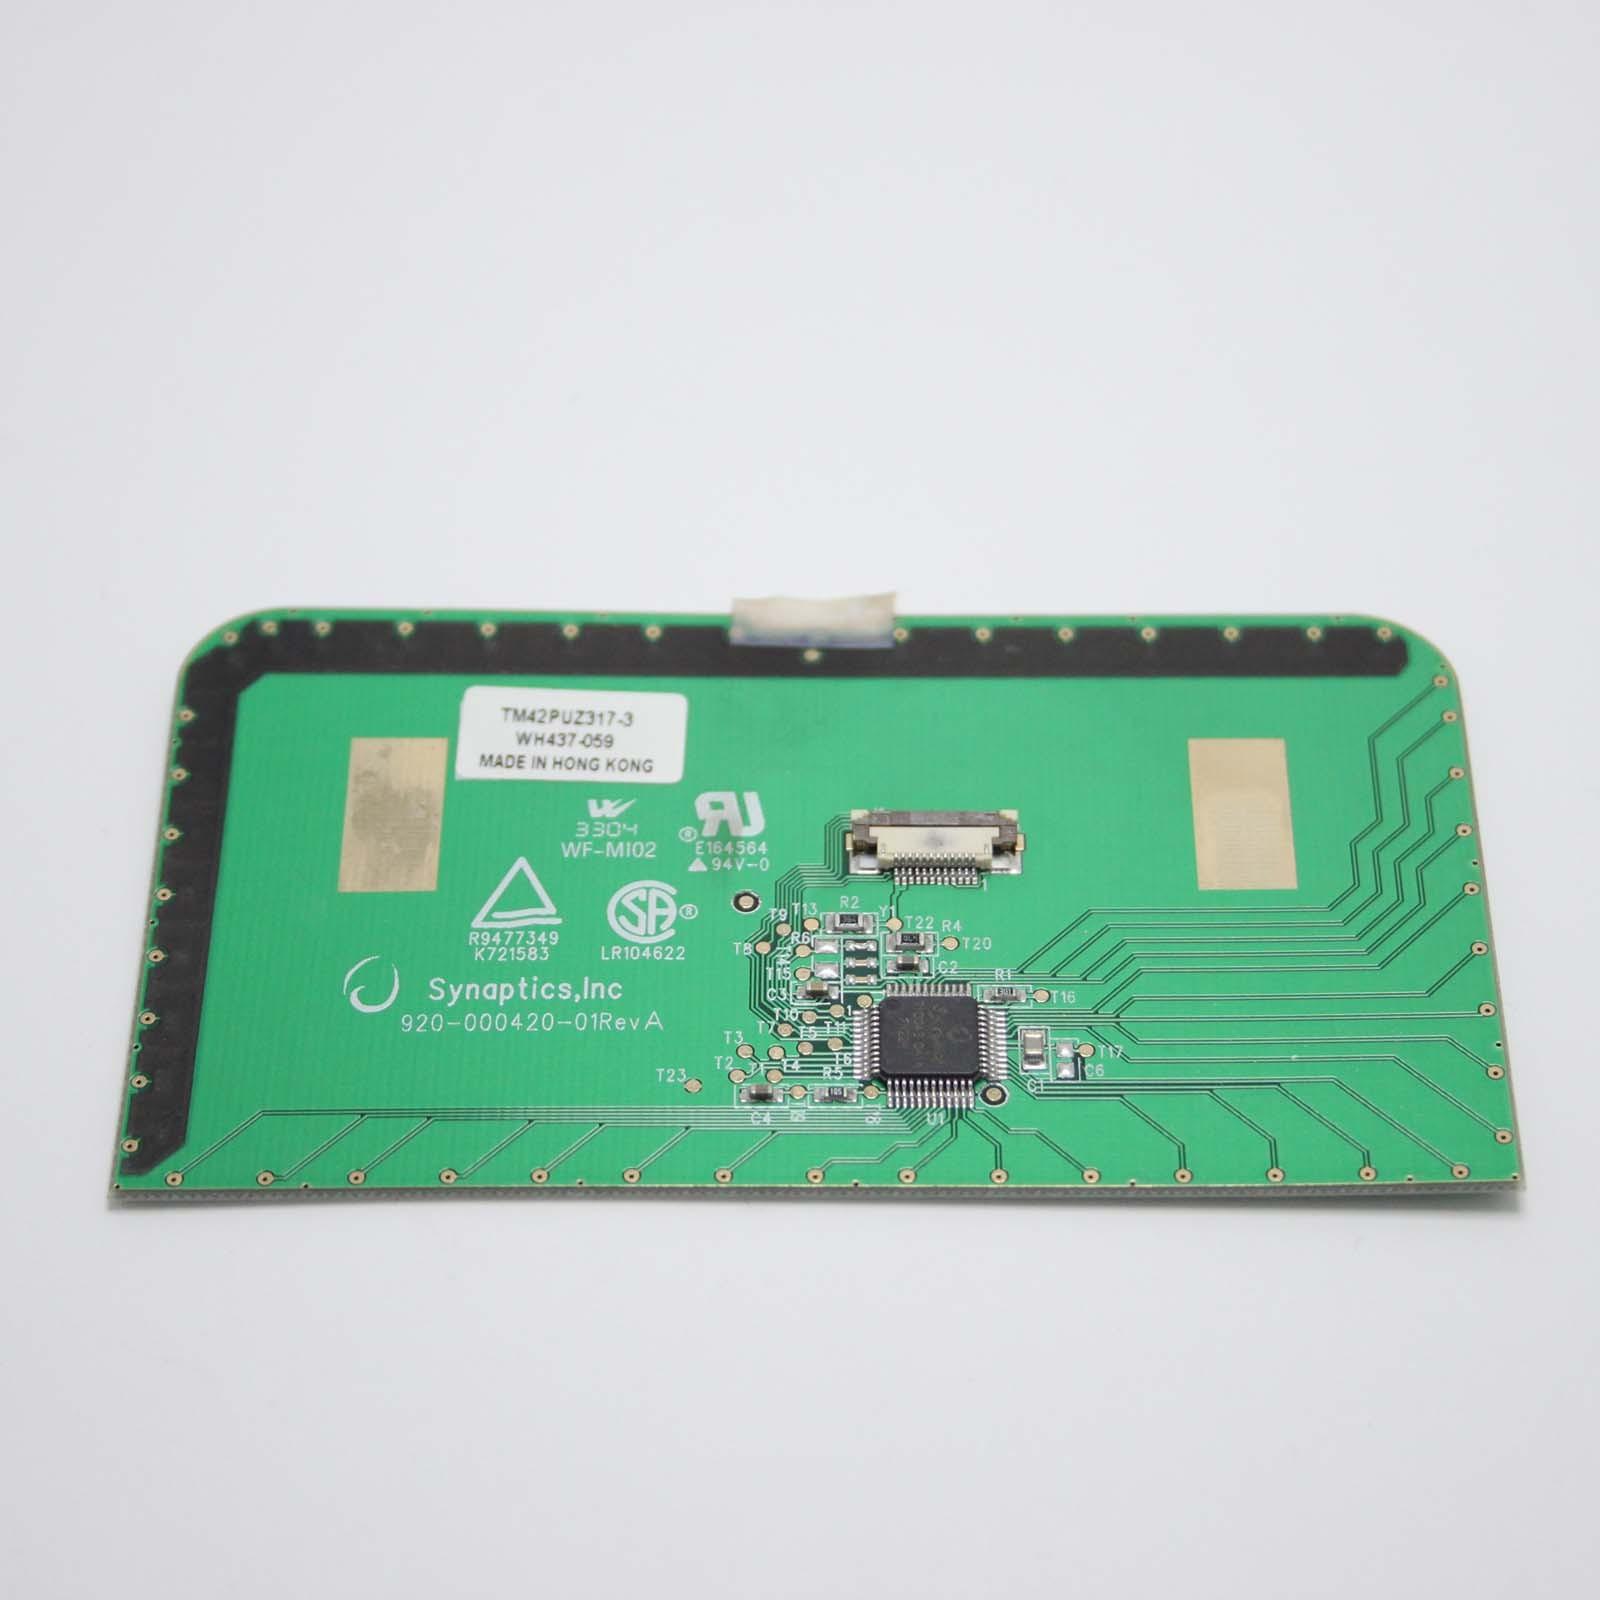 Touchpad TM42PUZ317-3 HP Pavilion ZD7000 Synaptics 920-000420-01RevA